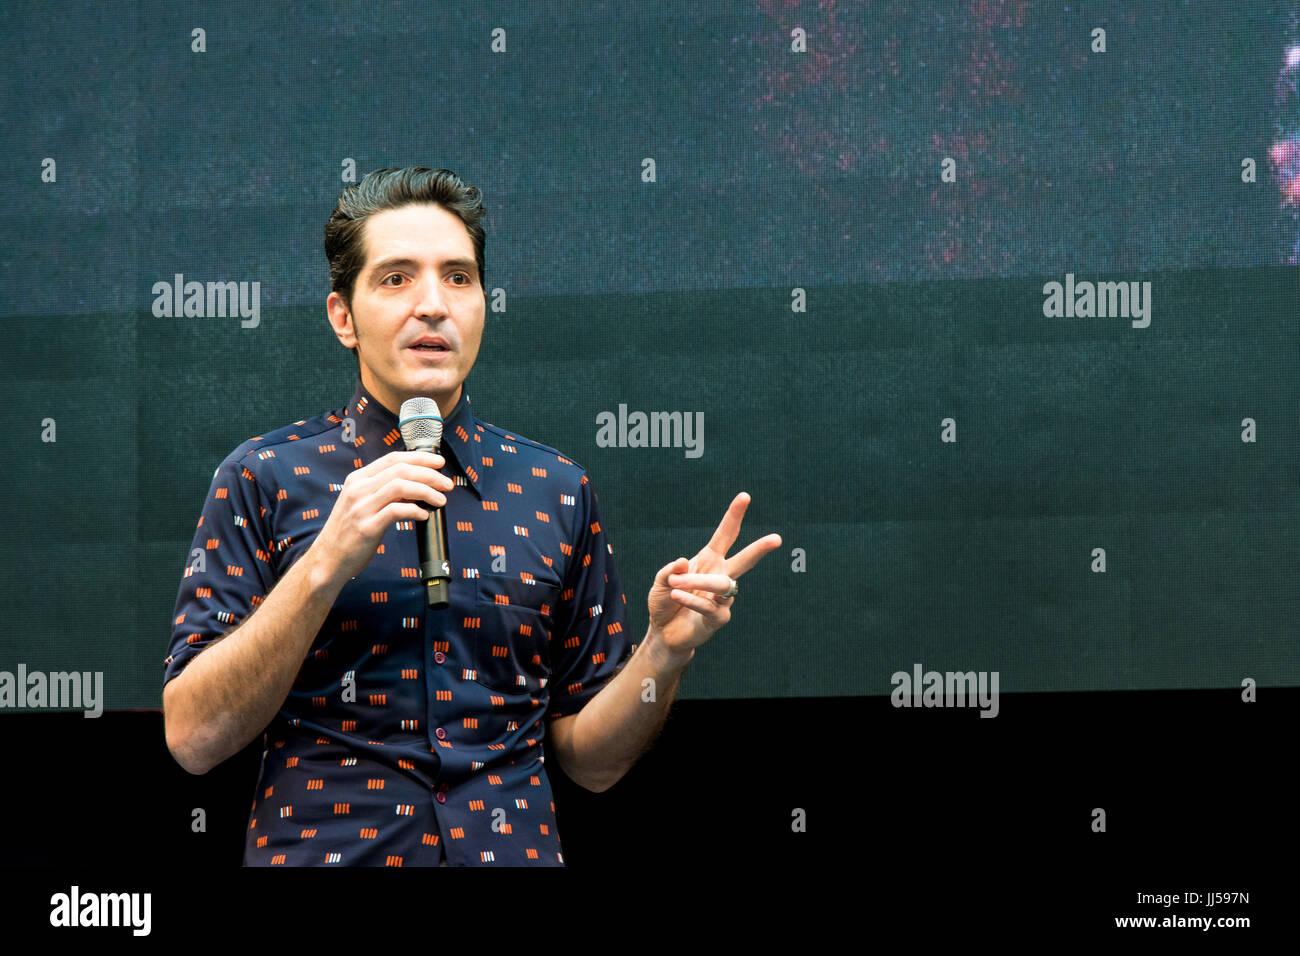 July 1st 2017. Stuttgart, Germany.David Dastmalchian talks about his roles in The Dark Knight, Prisoners, Ant-Man - Stock Image